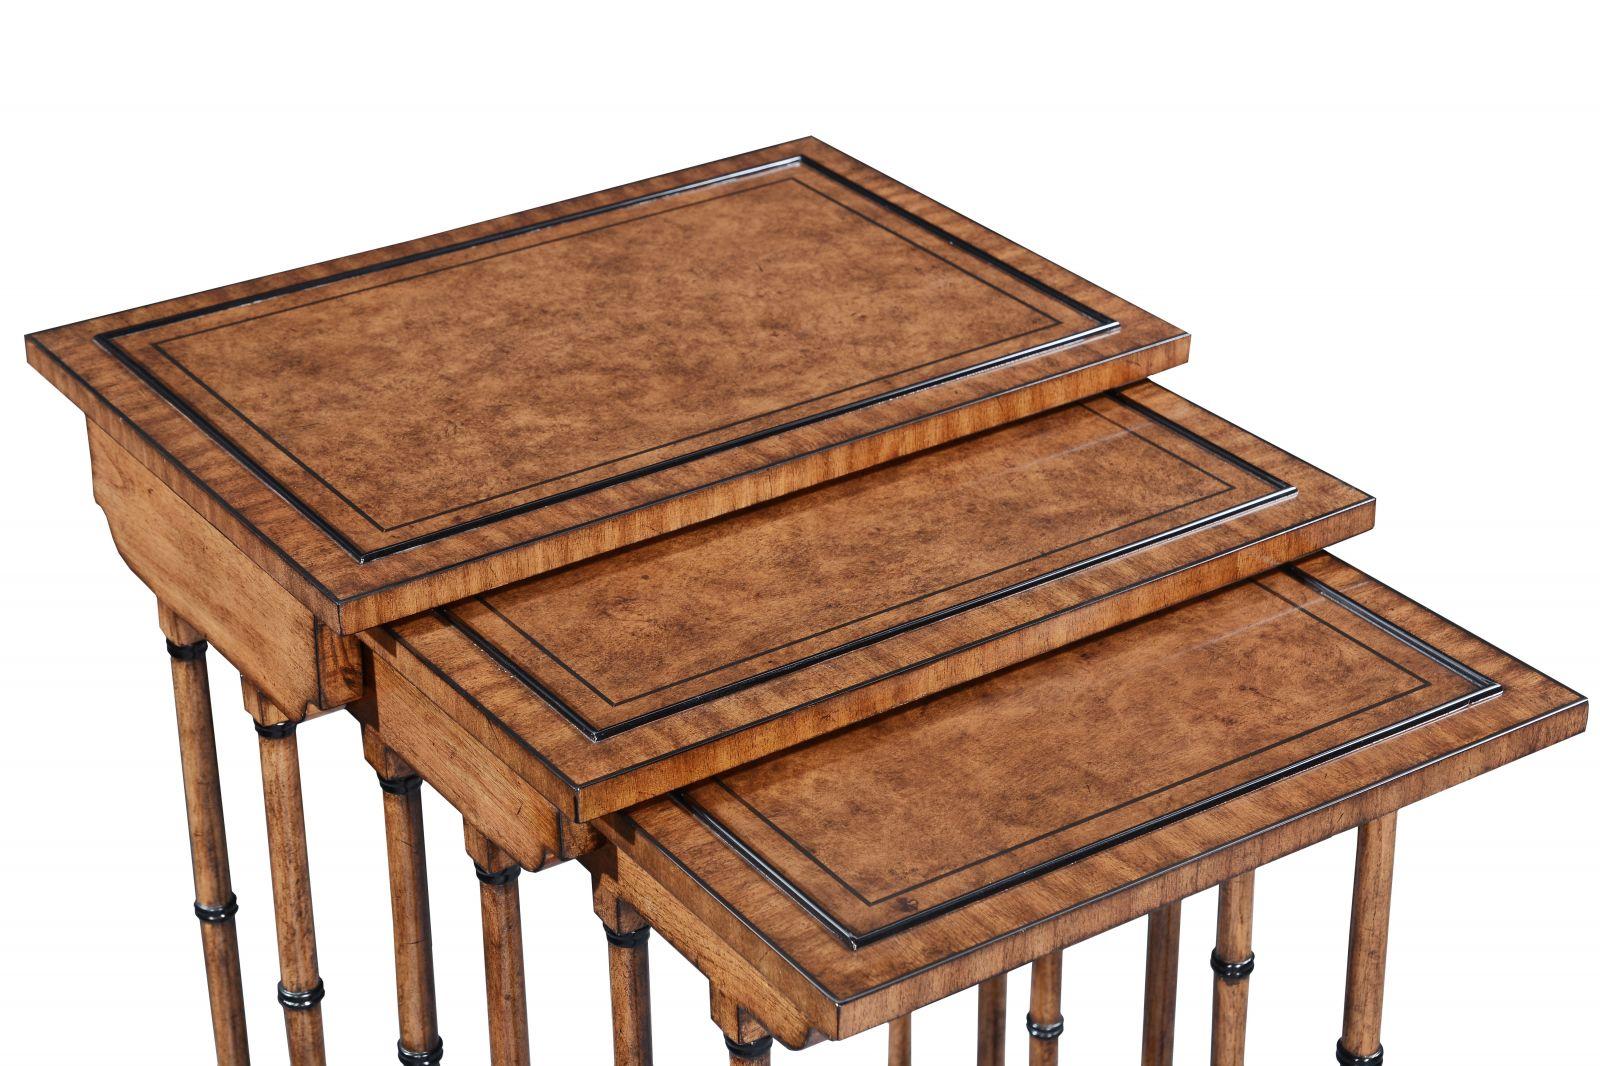 Antique style Nest of three tables - Burr oak